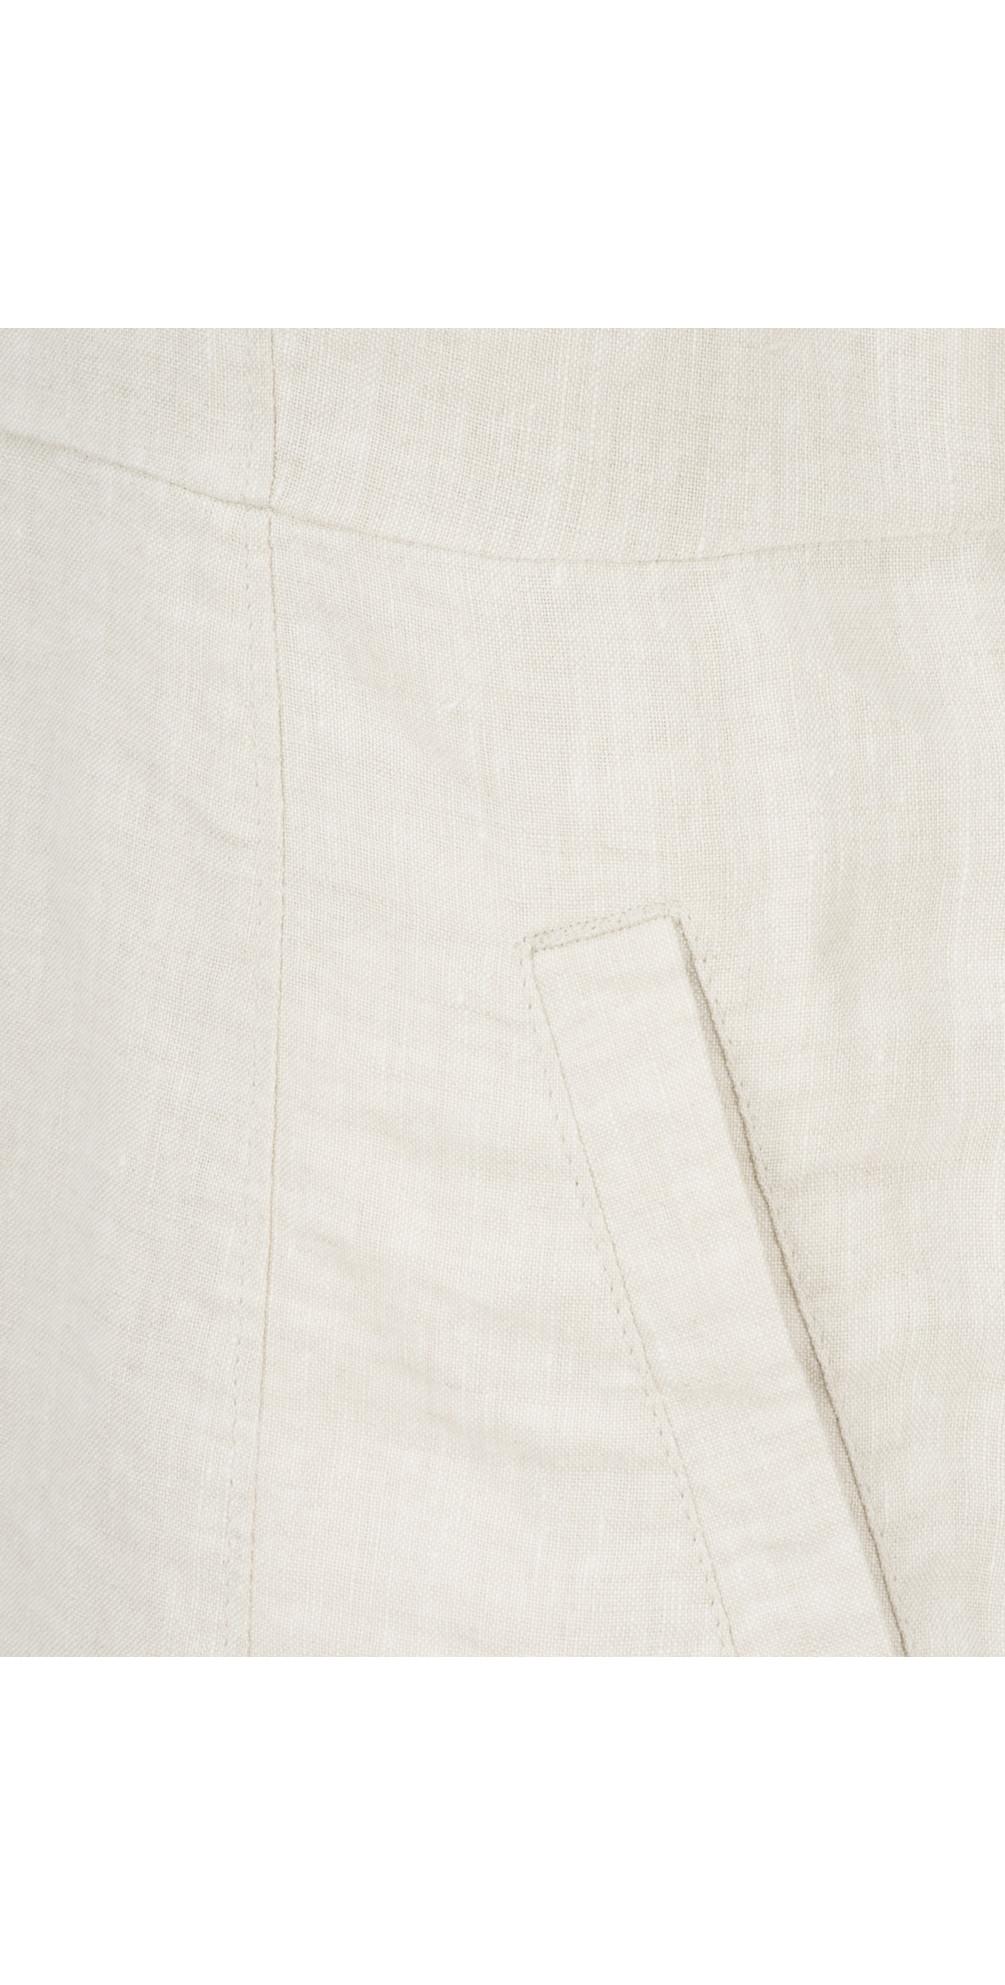 344cb72a Noa Noa Sleeveless Linen Dress Silver Gray. undefined